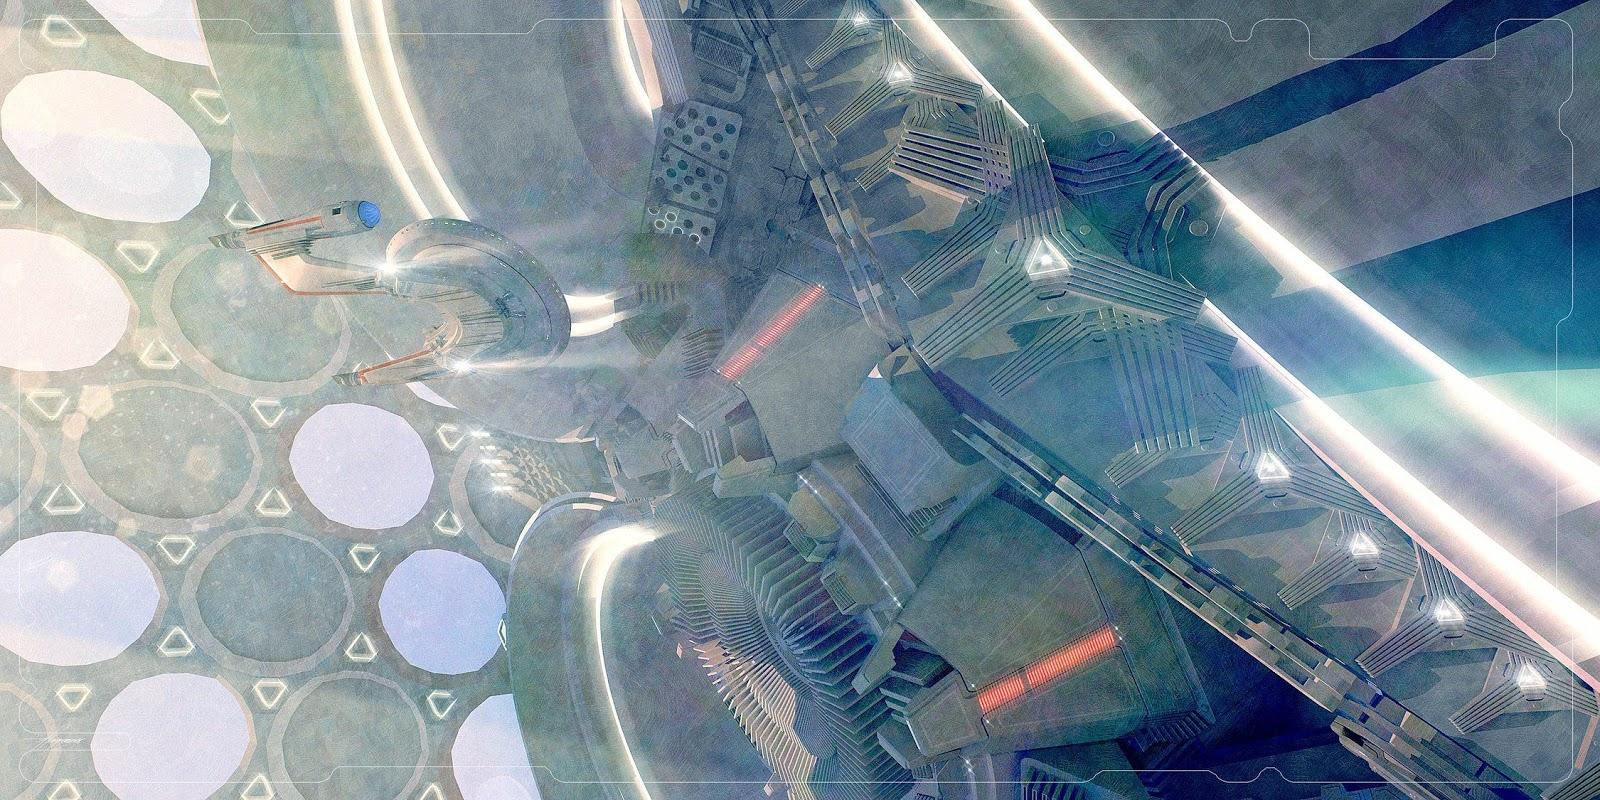 Sean Hargreaves Star Trek Beyond Starbase Yorktown interior USS Franklin concept art.jpg